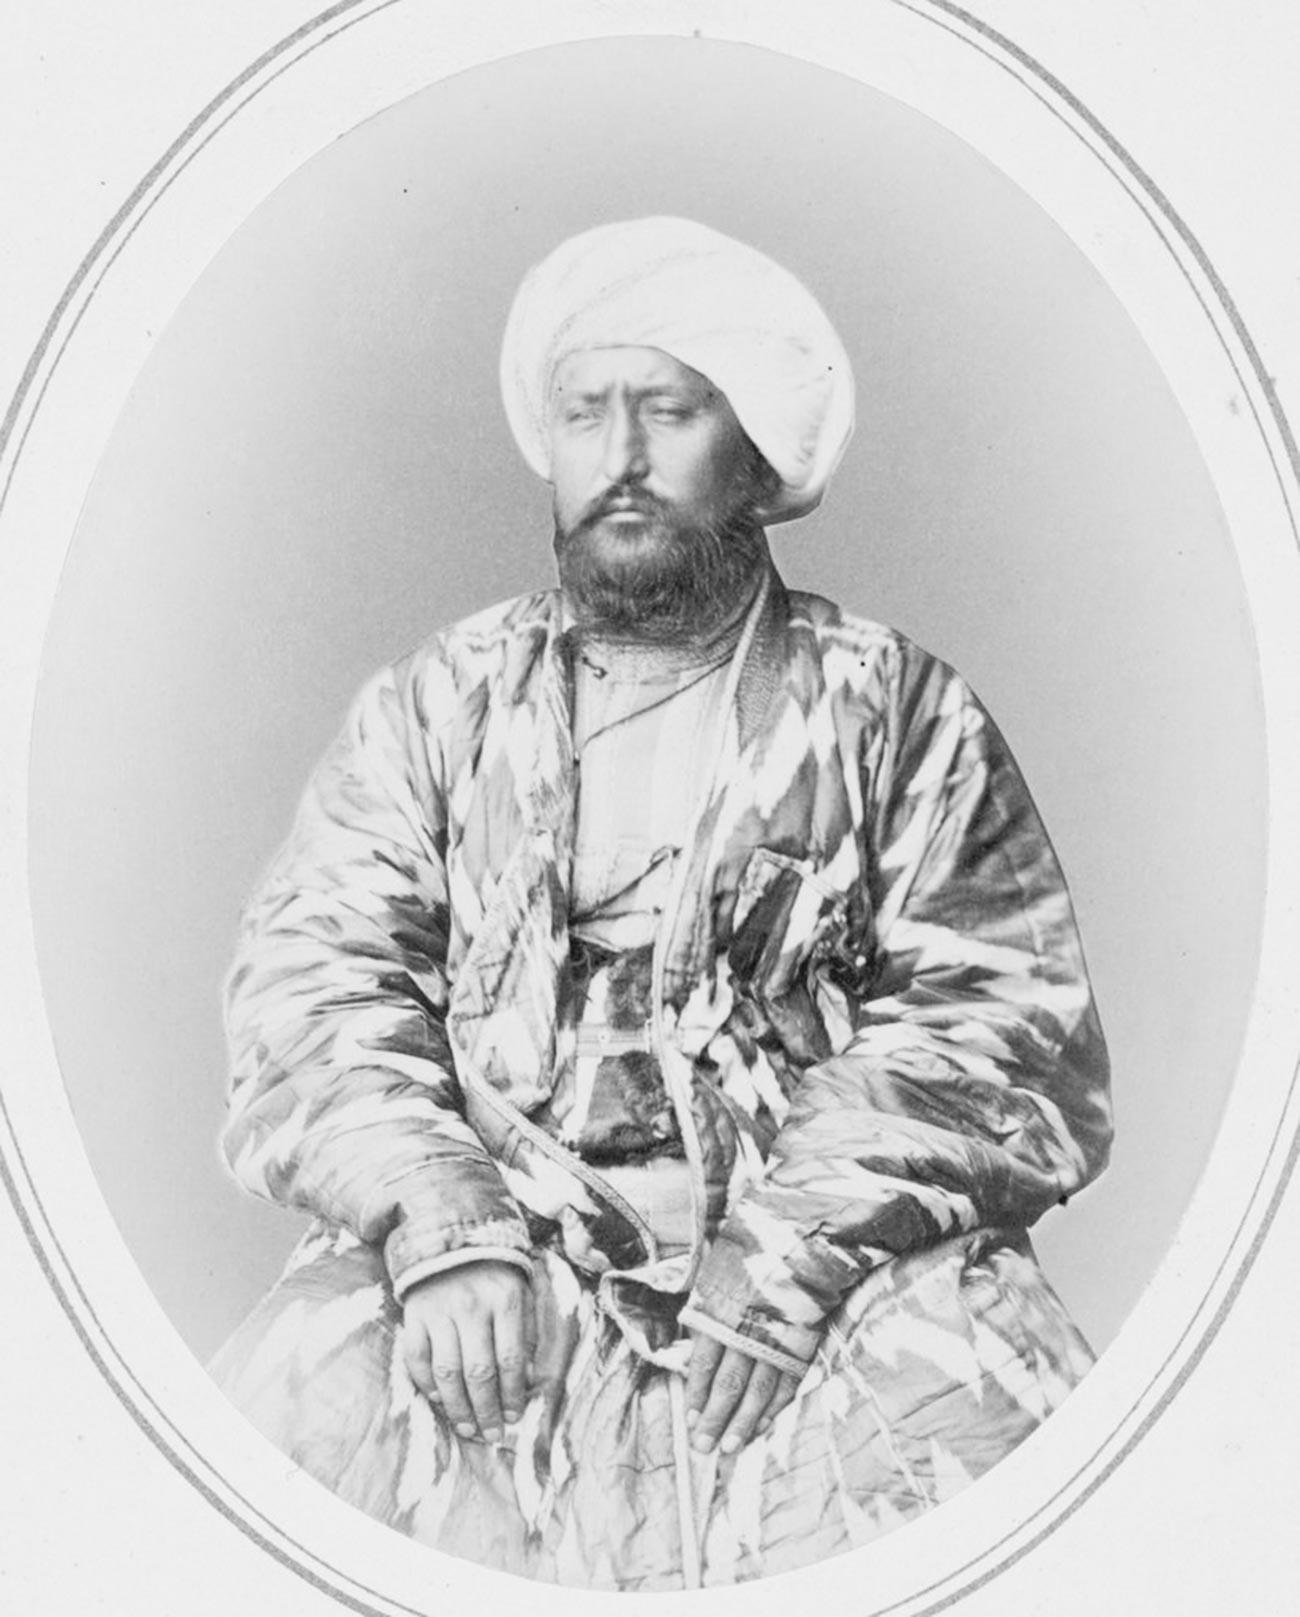 Правитель Коканада Сеид Мухамед Худаяр Хан.